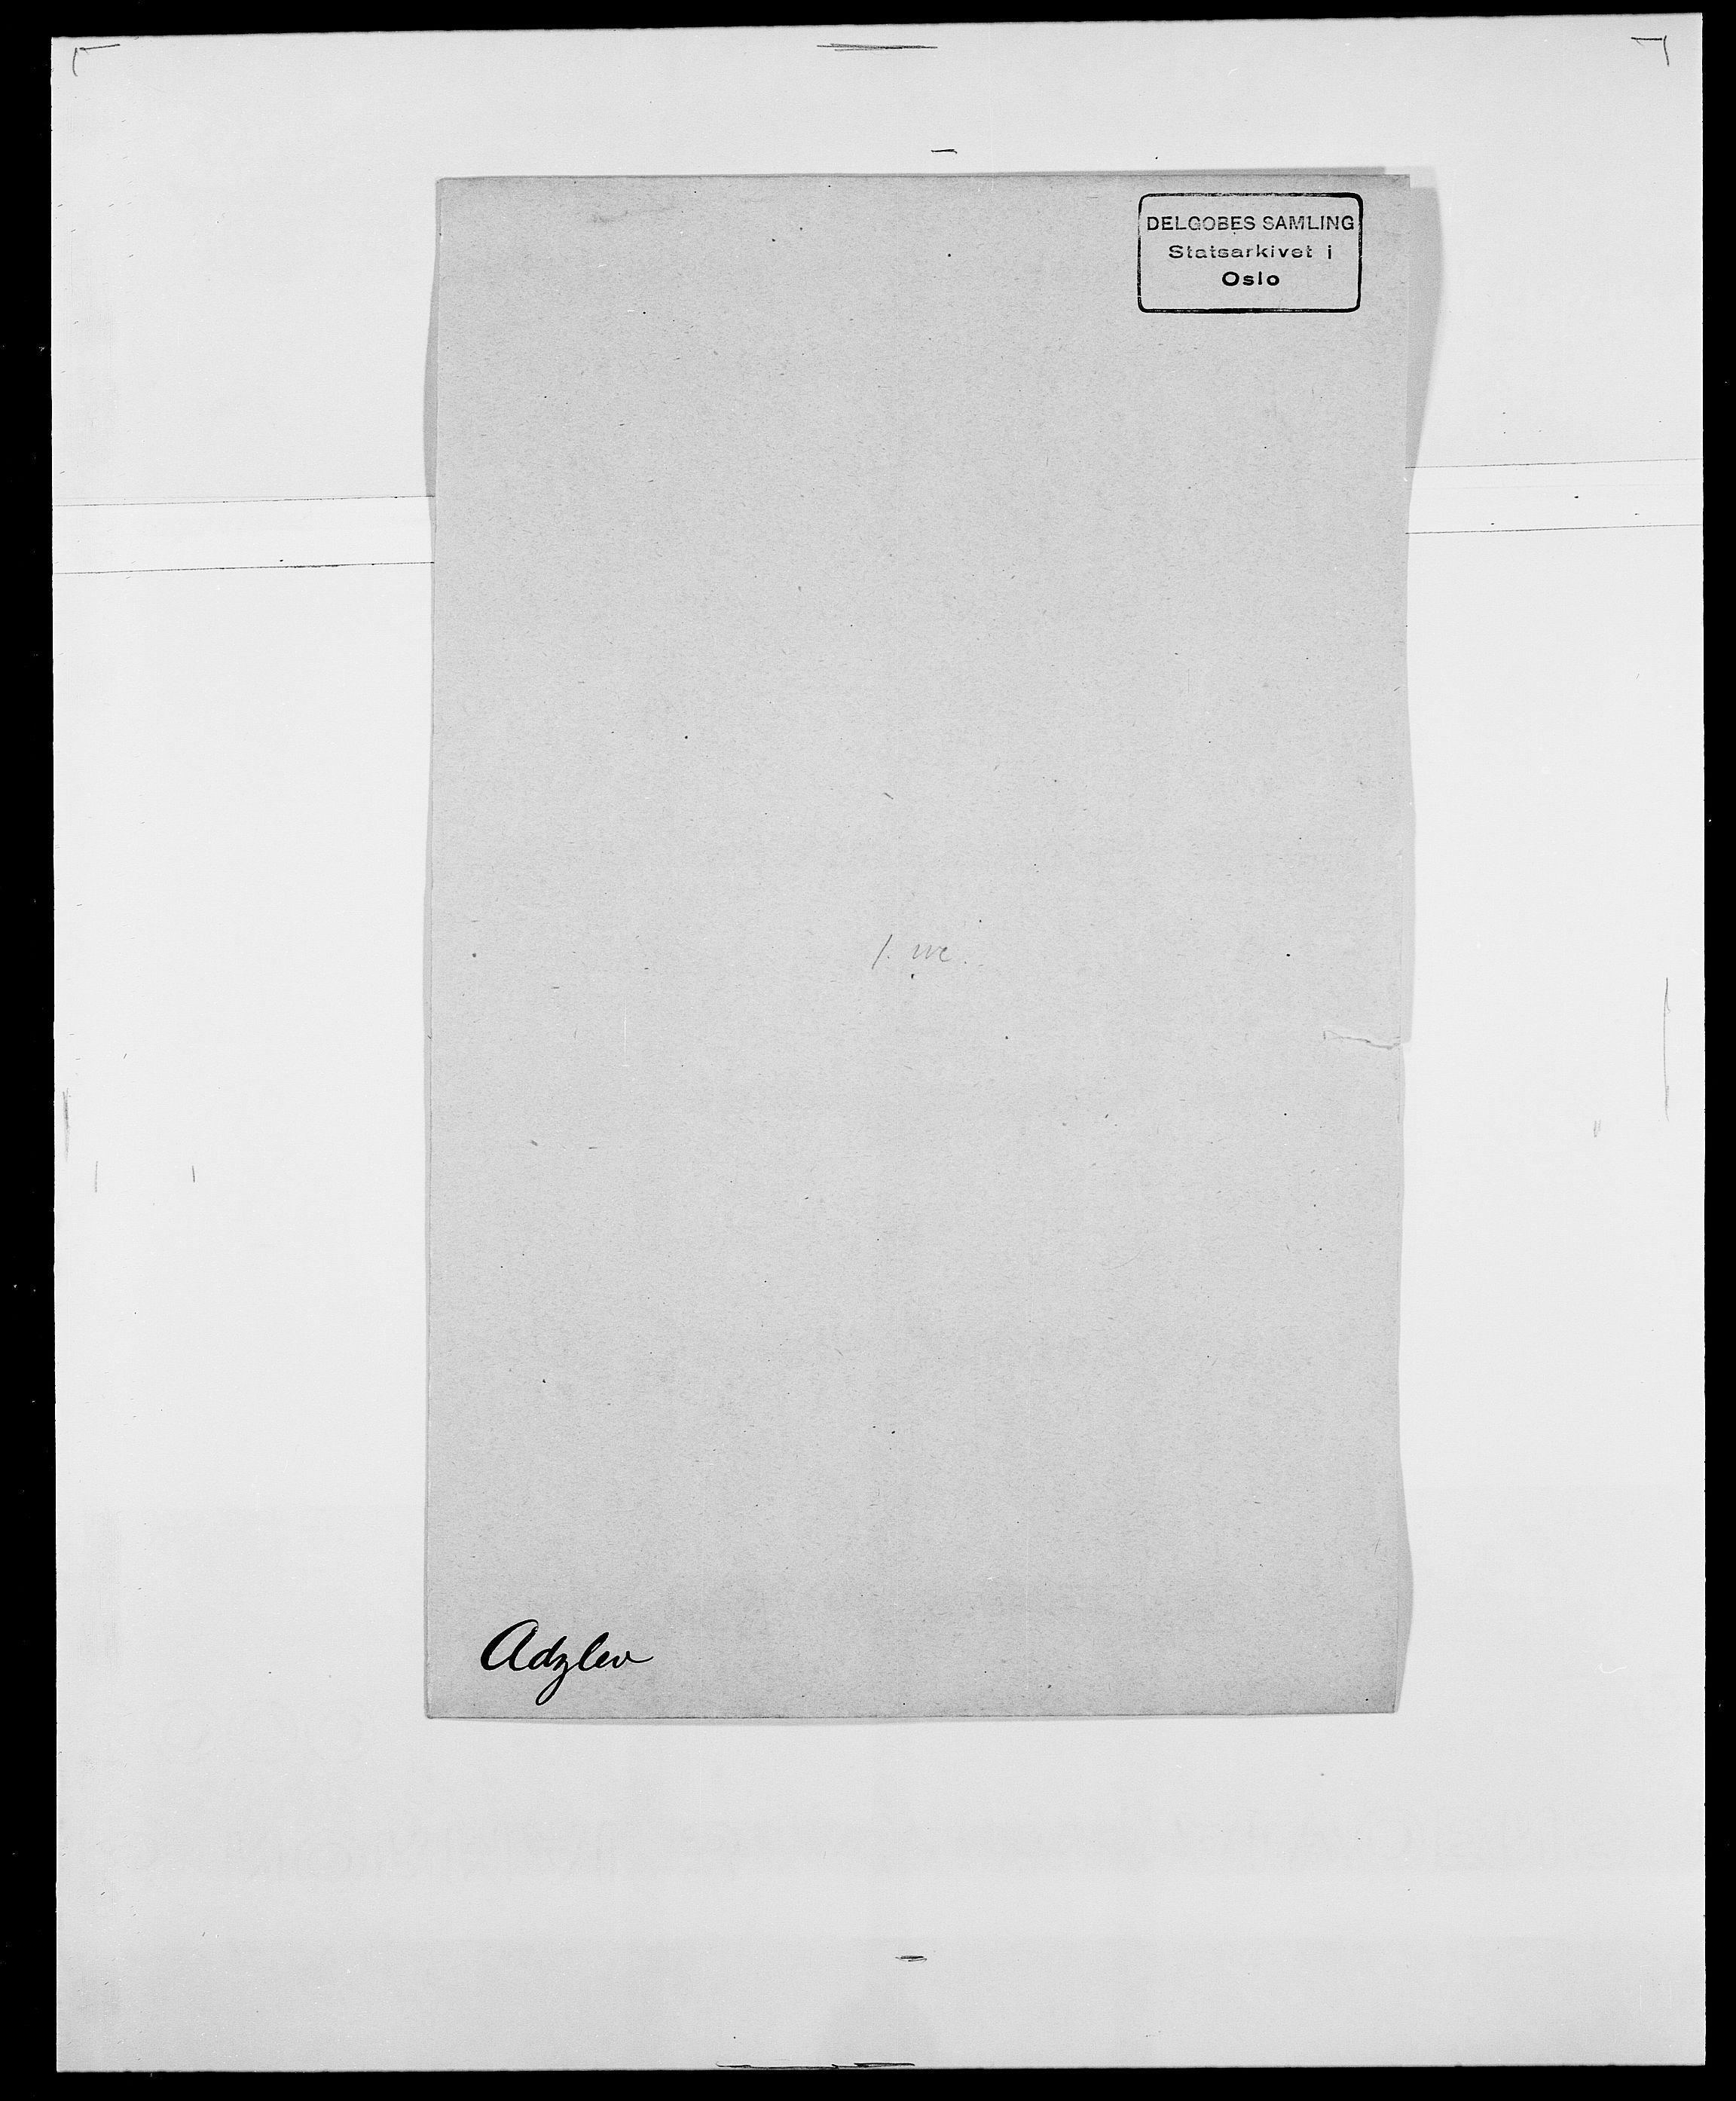 SAO, Delgobe, Charles Antoine - samling, D/Da/L0001: Aabye - Angerman, s. 277